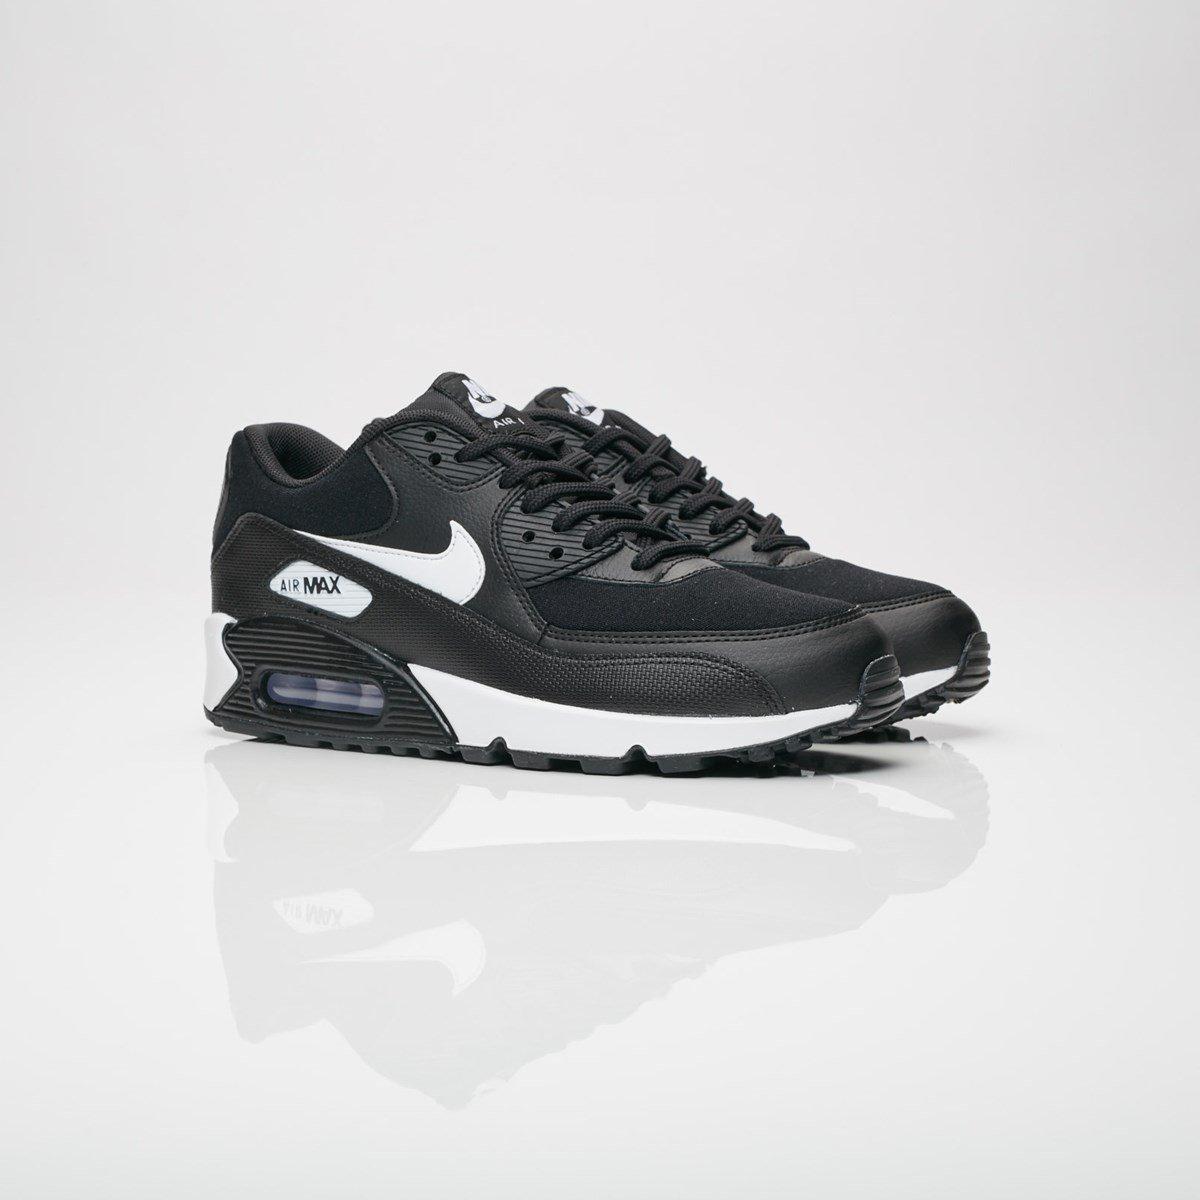 promo code cd880 d9b1f nike wmns air max 90 325213 047 sneakers   streetwear på nätet sen 1999